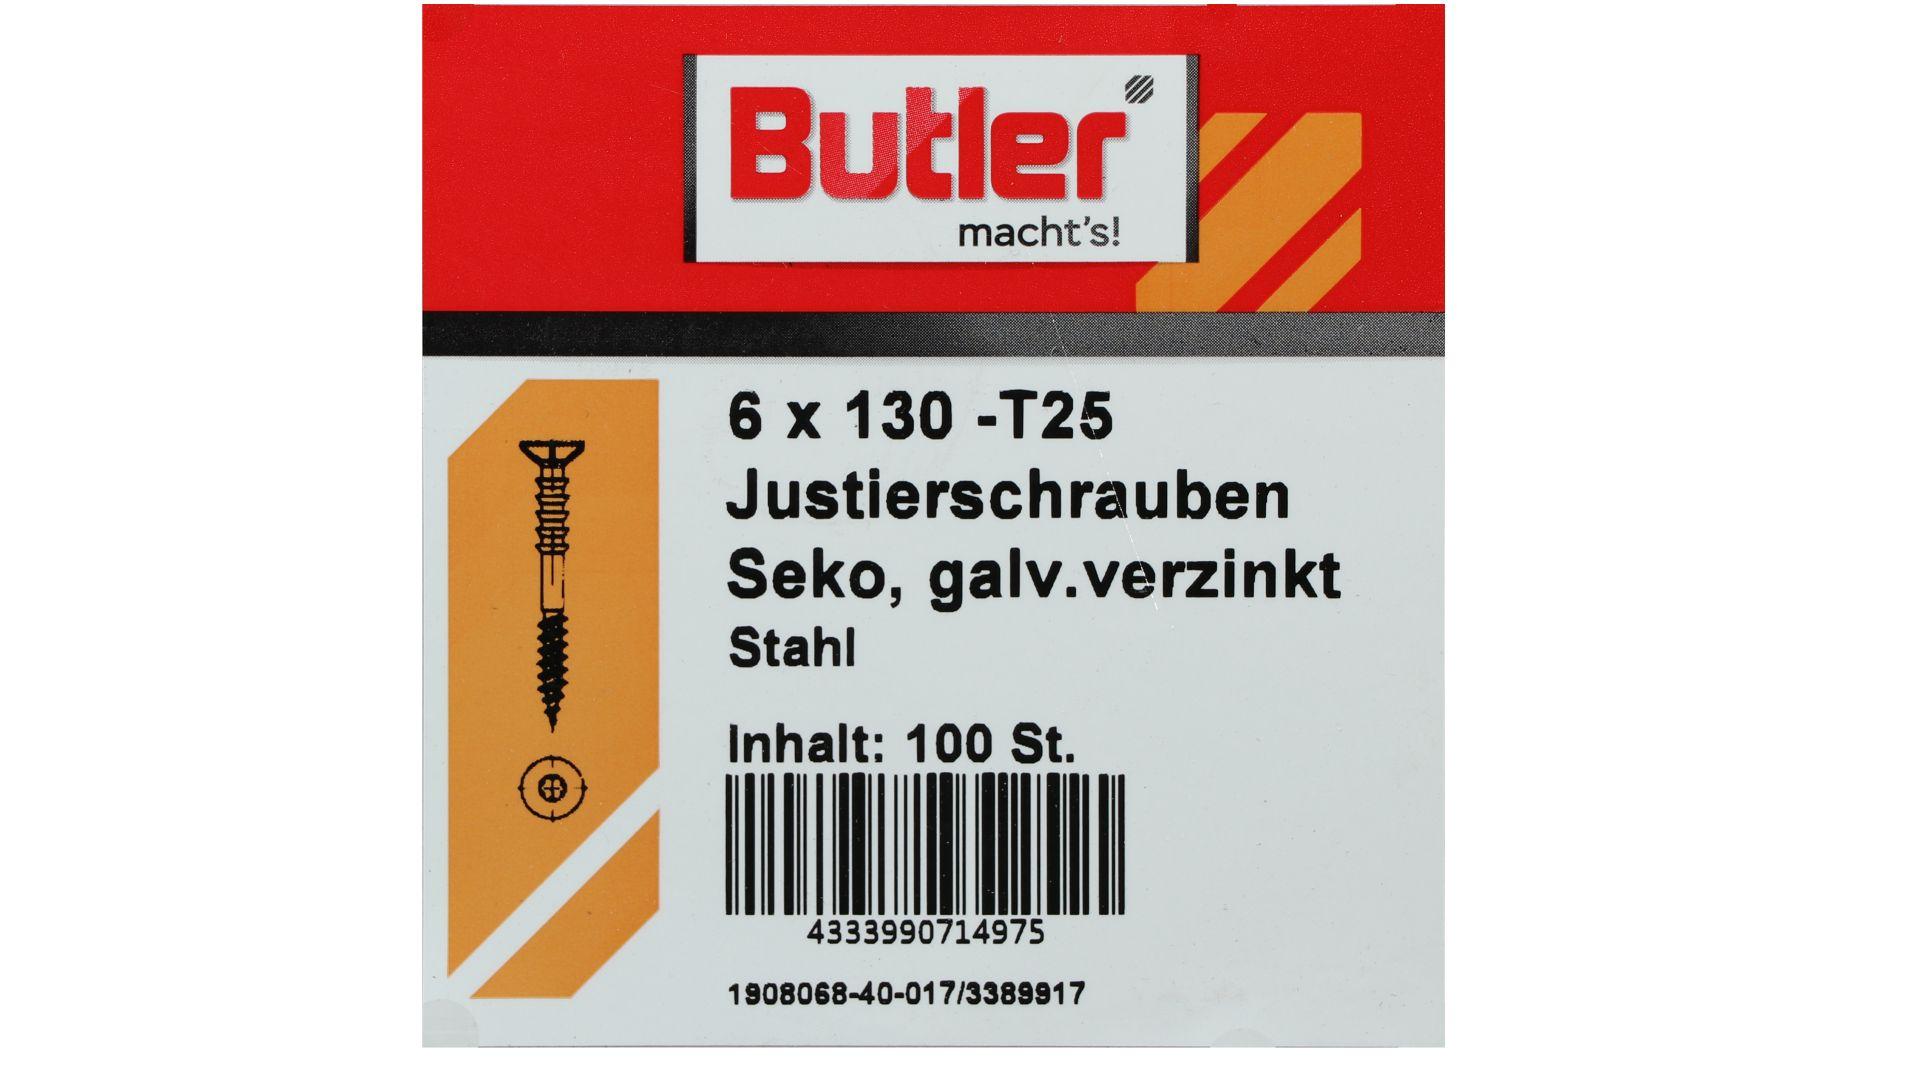 Butler macht's! Justierschraube, Stahl, Senkkopf, galvanisch verzinkt, T25, 6 x 130 mm, 100 Stück